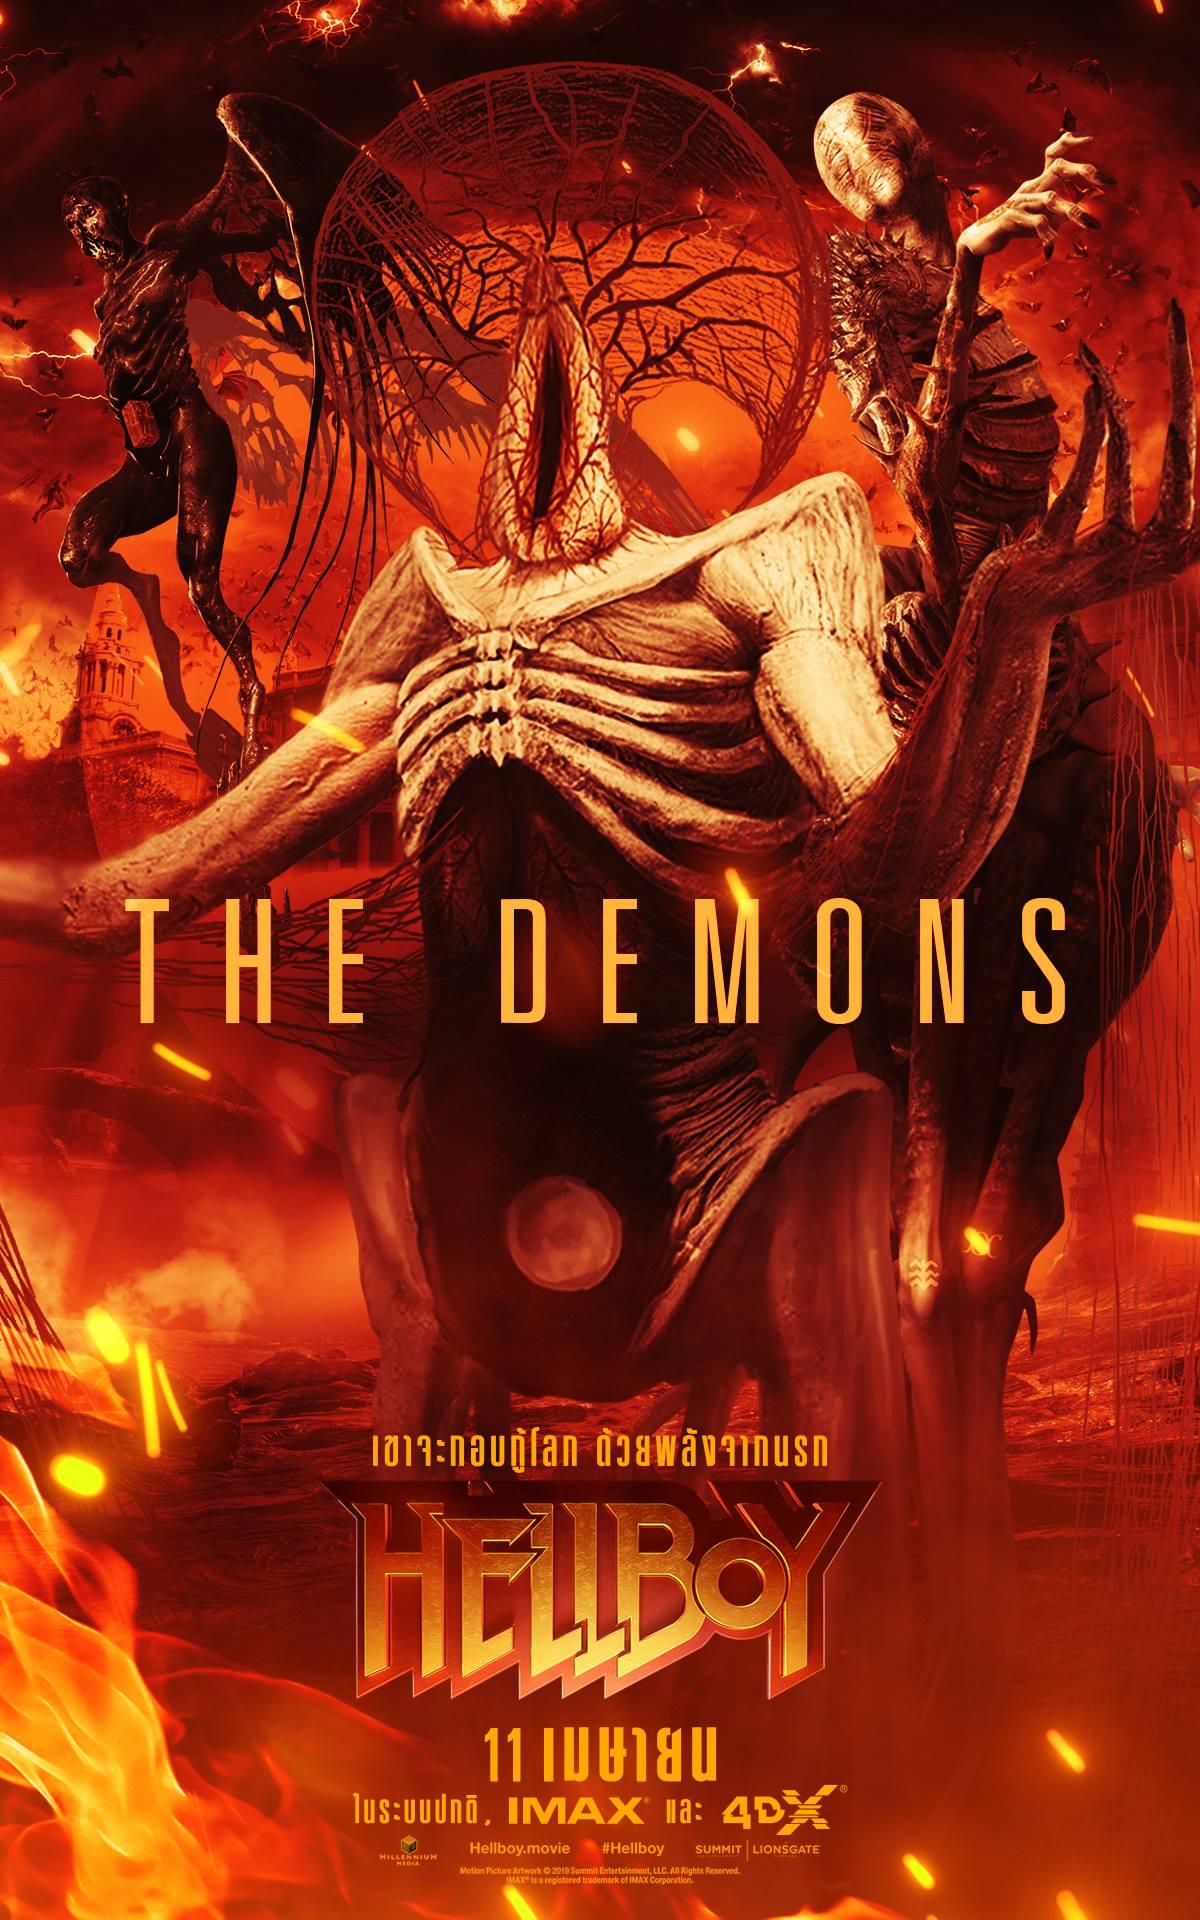 Hellboy Movie Characte... Milla Jovovich Hellboy Reboot